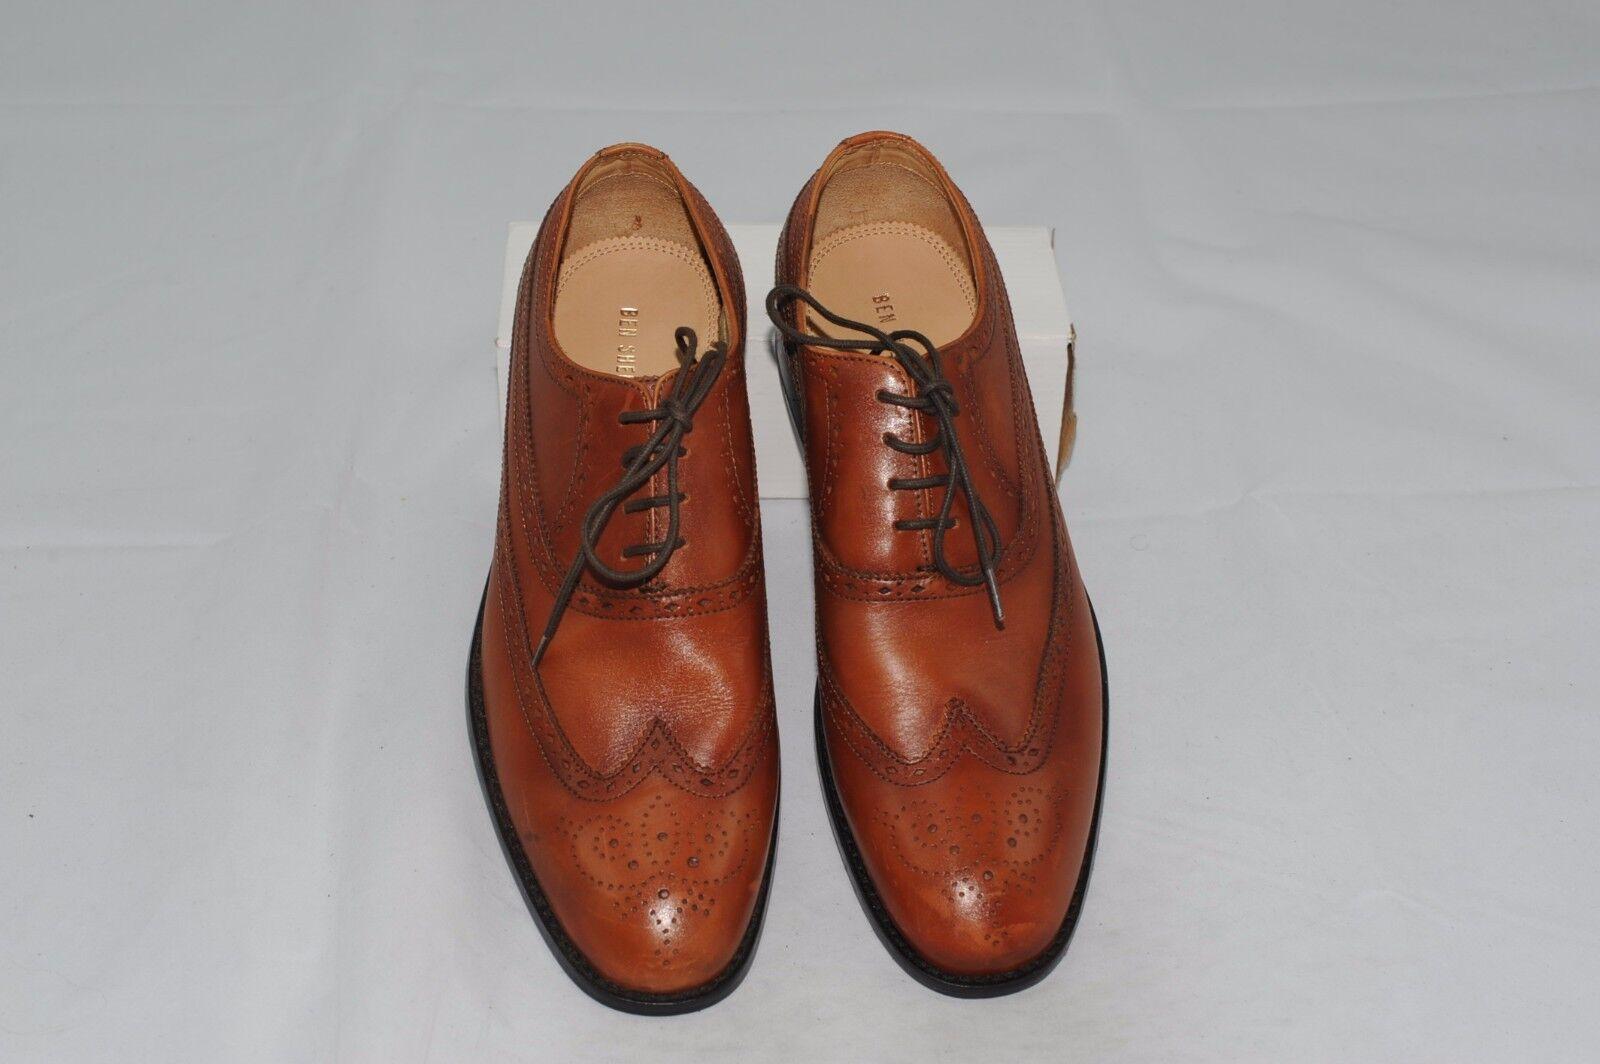 NWT Ben Sherman Men's Leather Wingtip Oxford Dress shoes 7.5